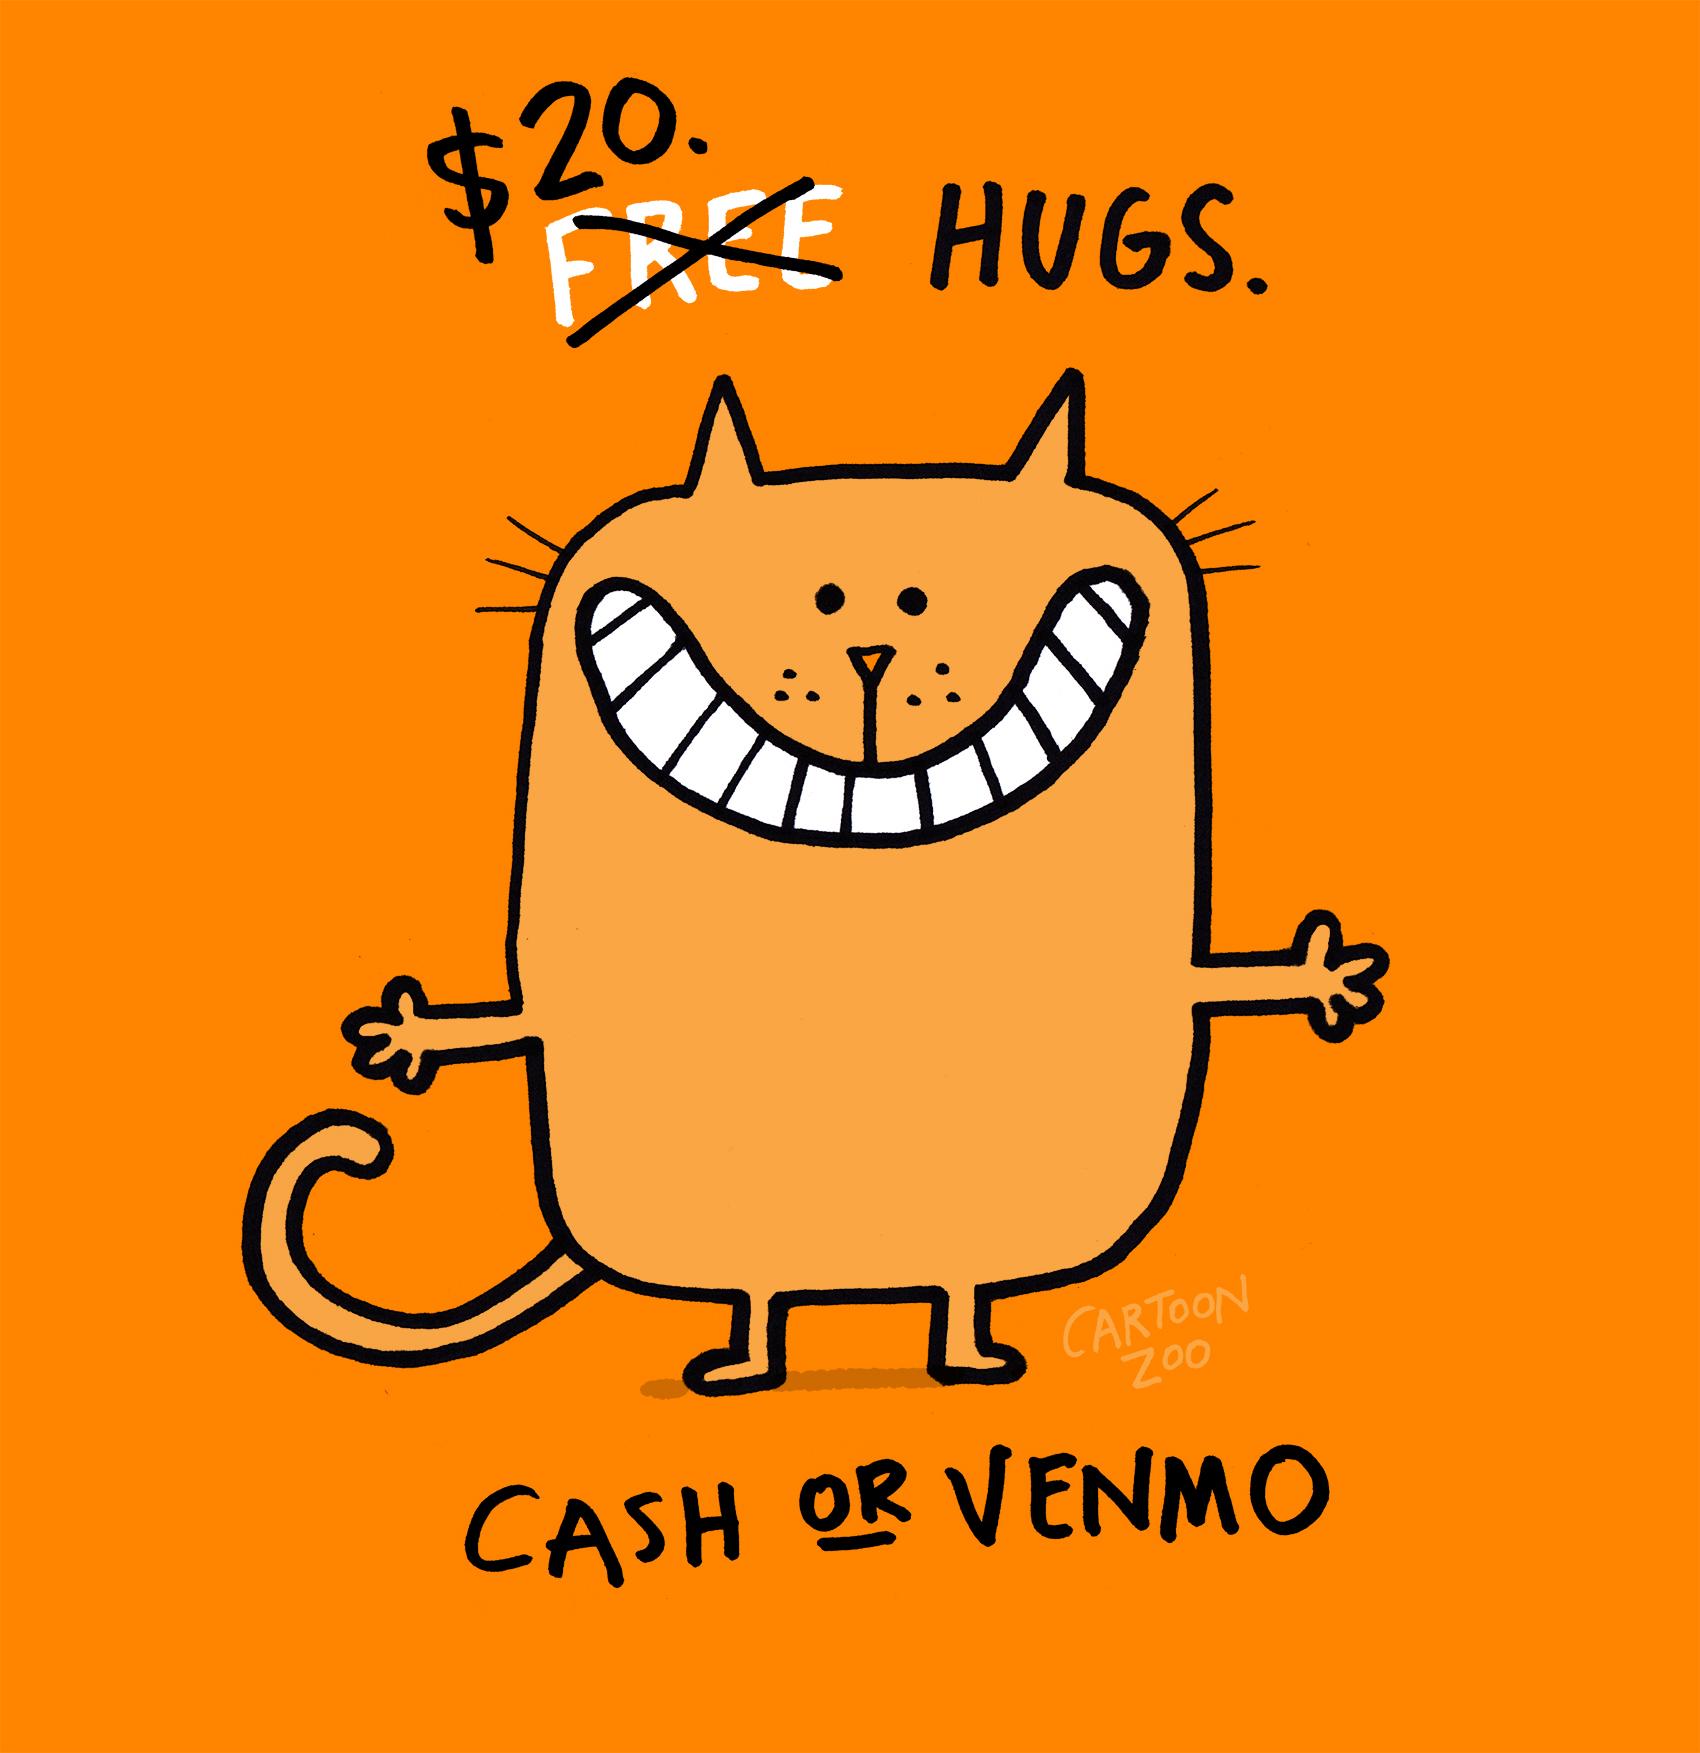 free_hugs_orginal_orange_$20_1701.jpg